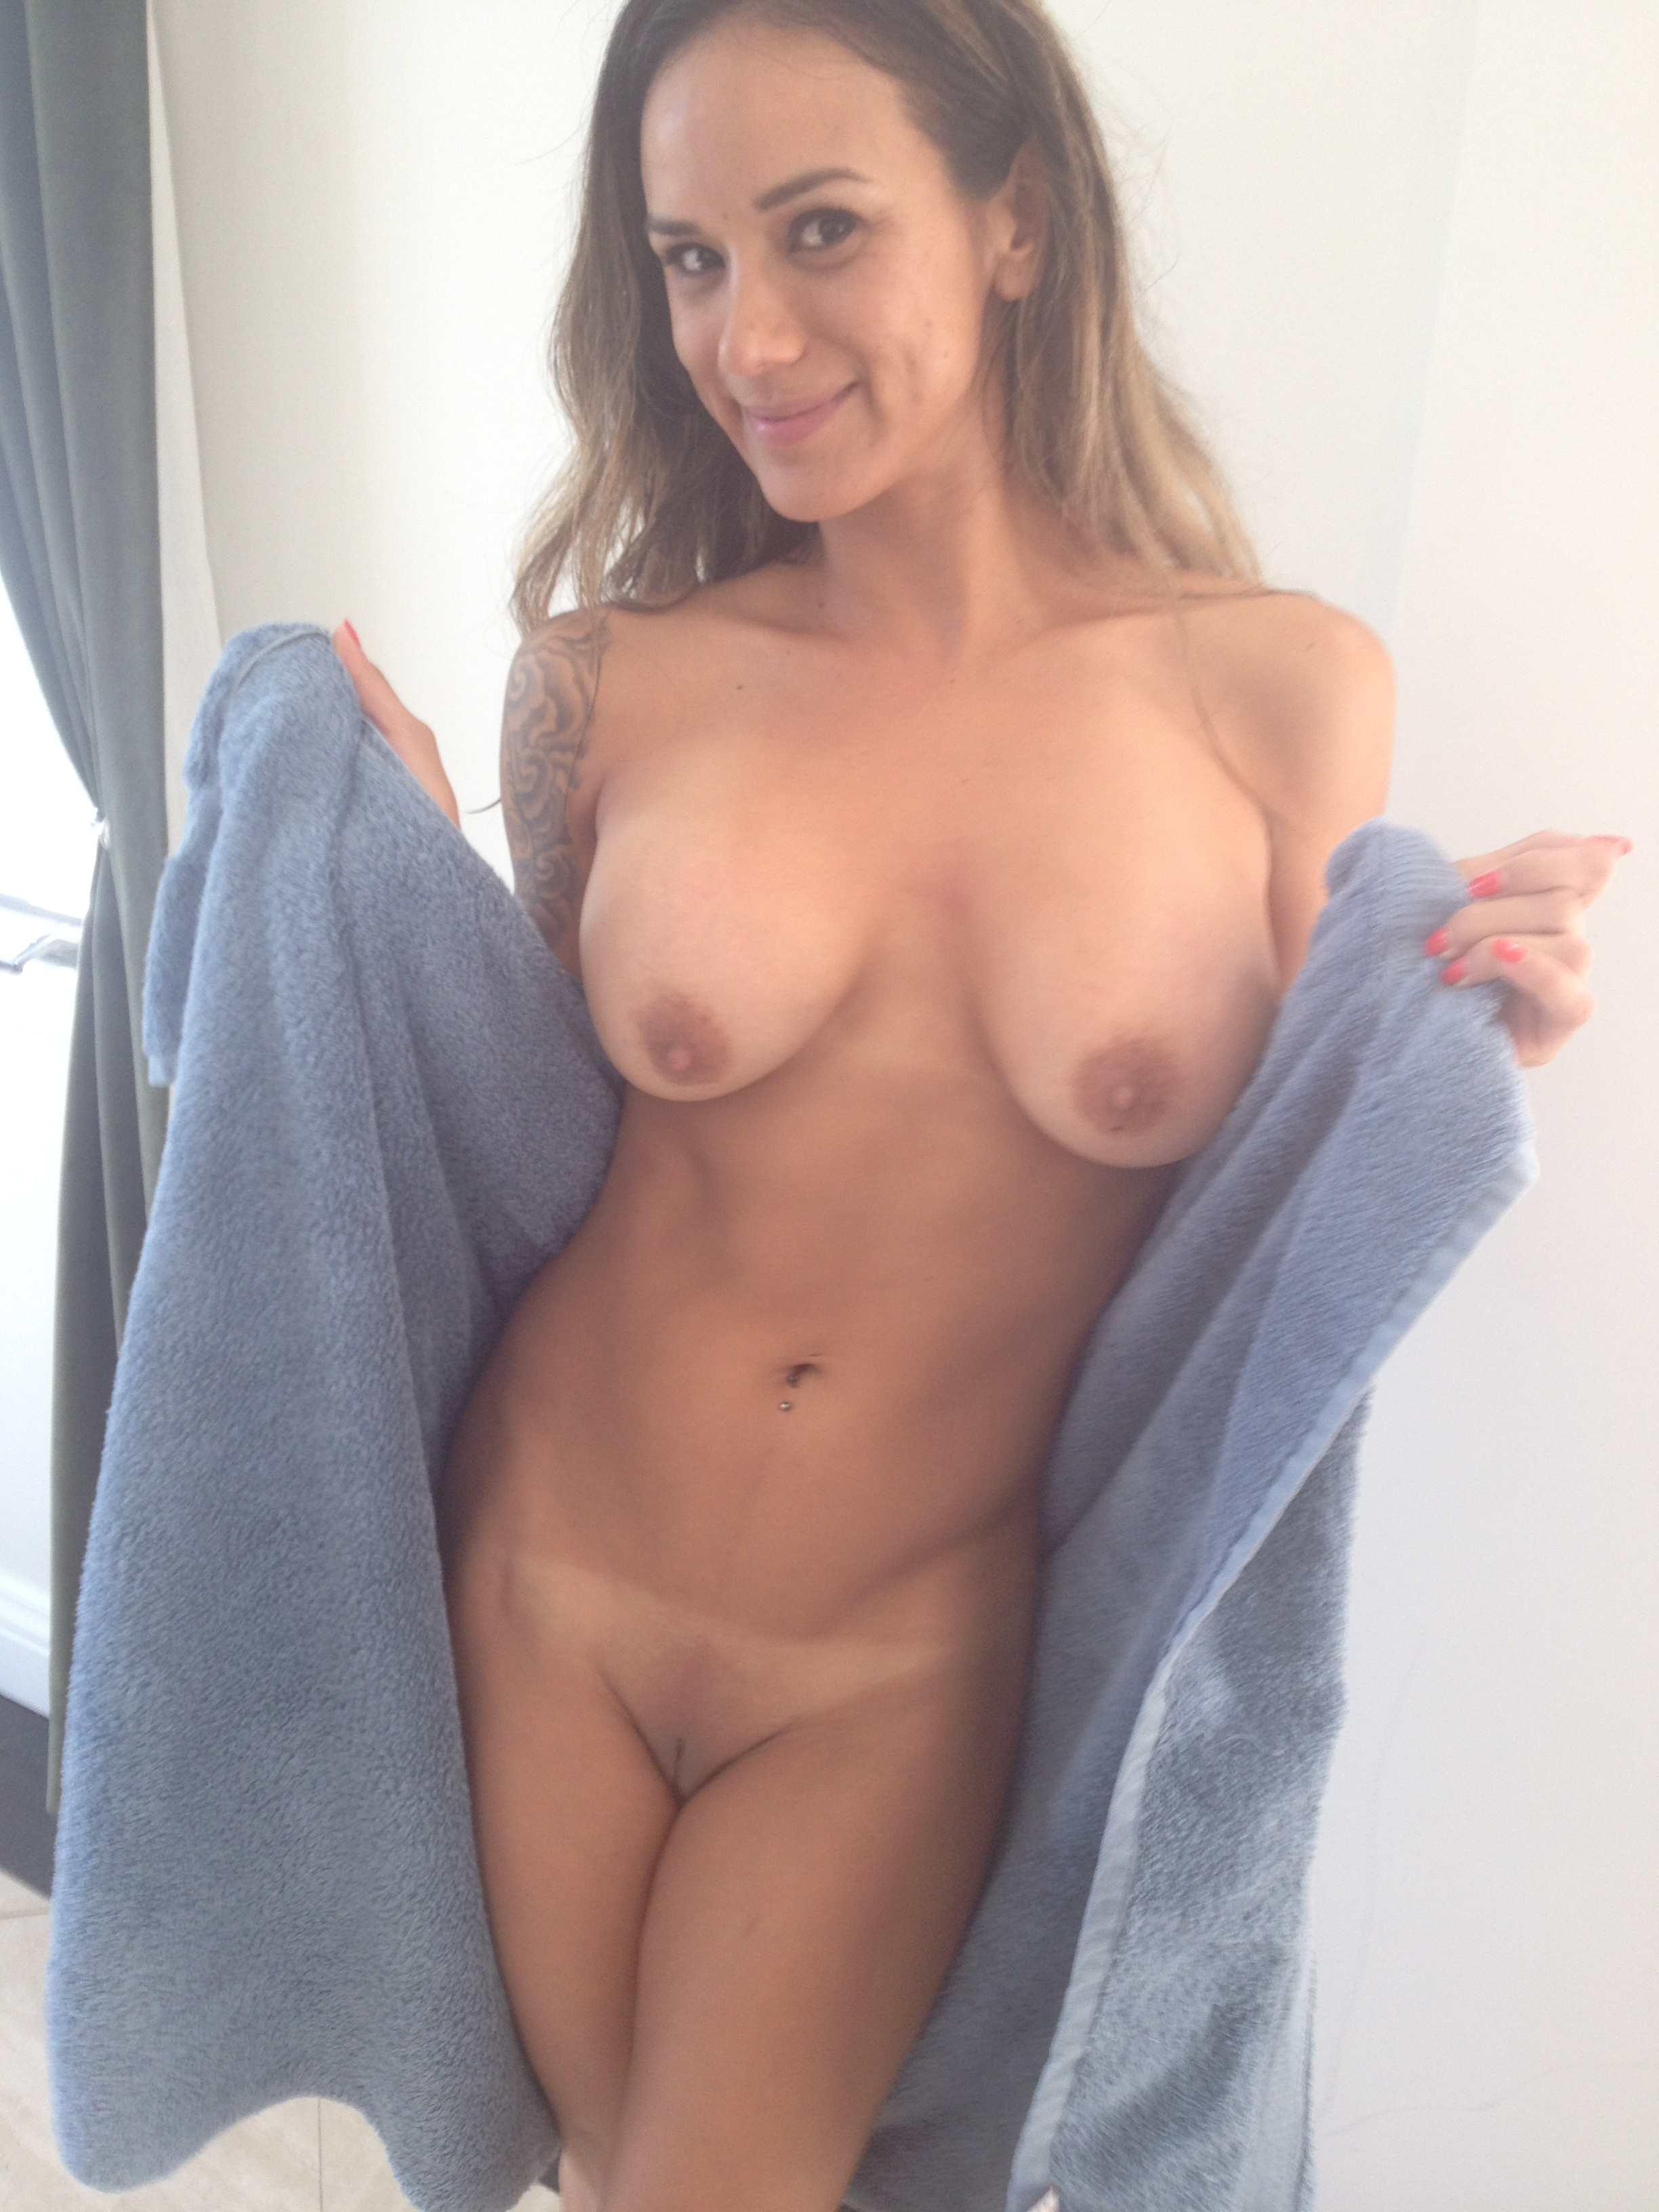 Nadia Styles Donna Dana Dearmond Porn double penetration with nadia styles - james deen blog